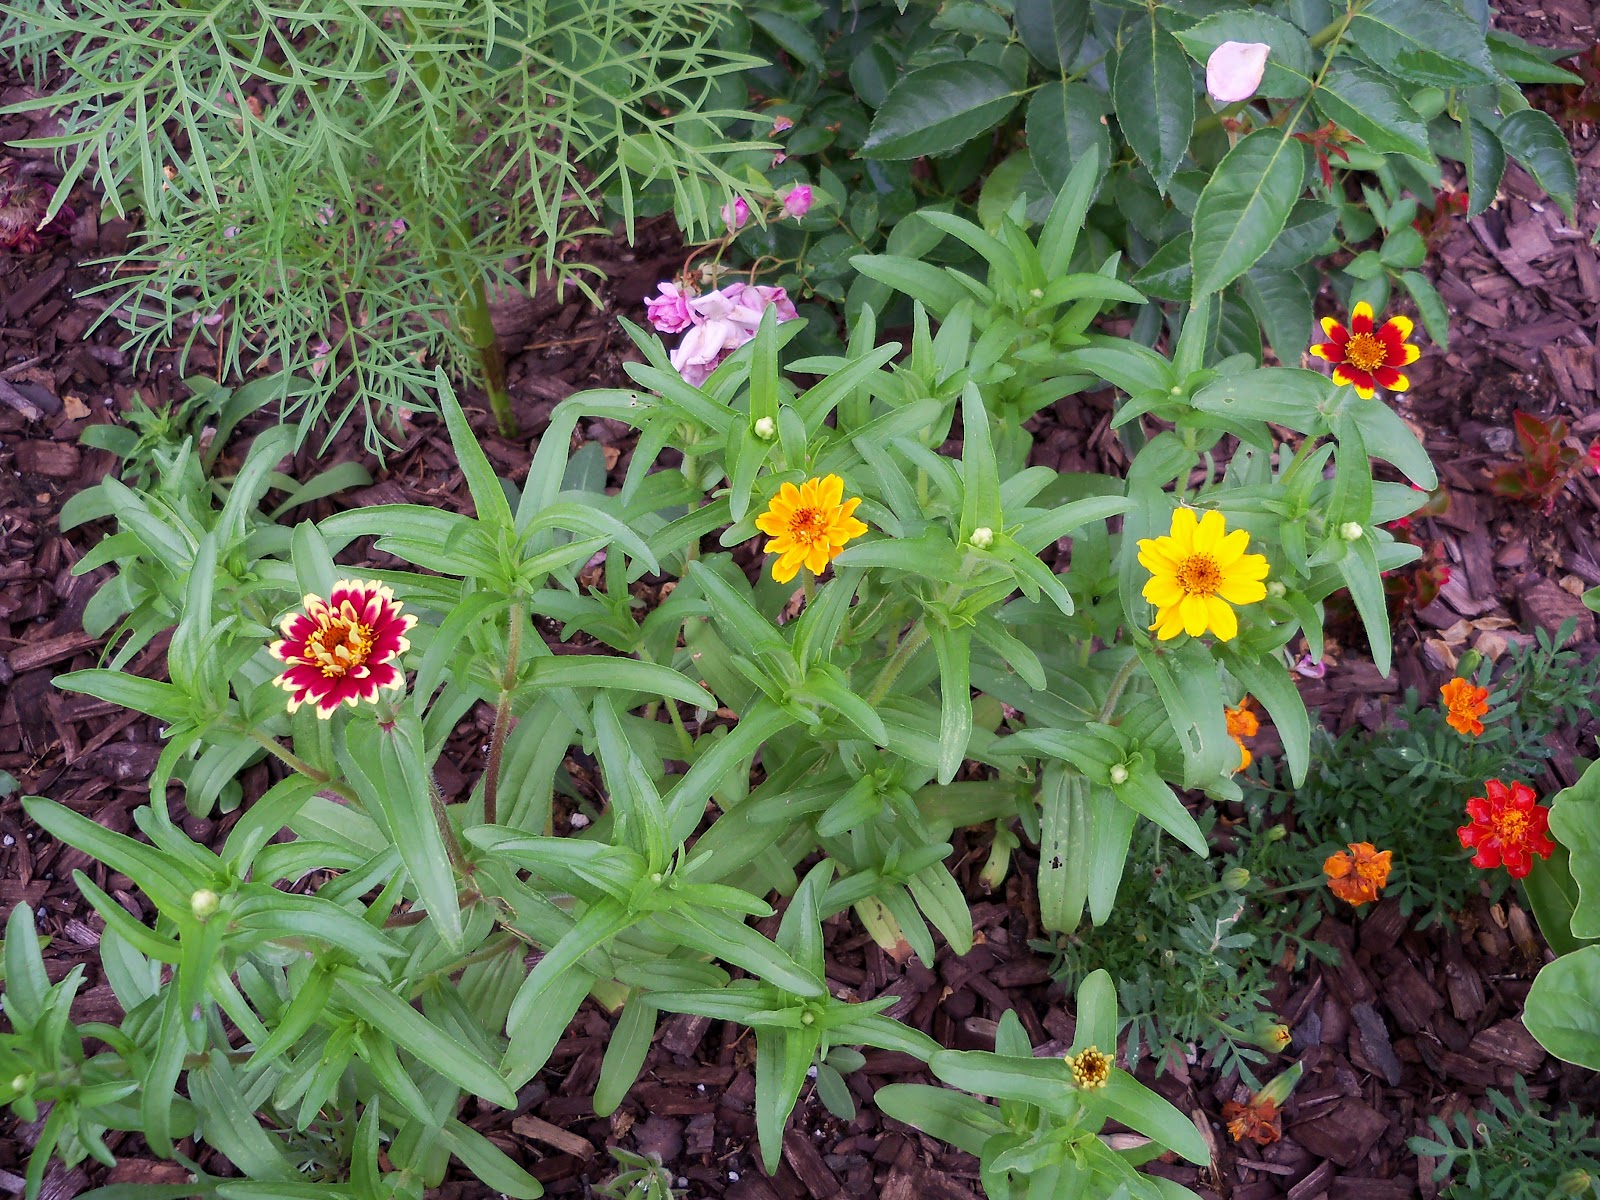 Gardening 2010, Part Two - 101_2445.JPG